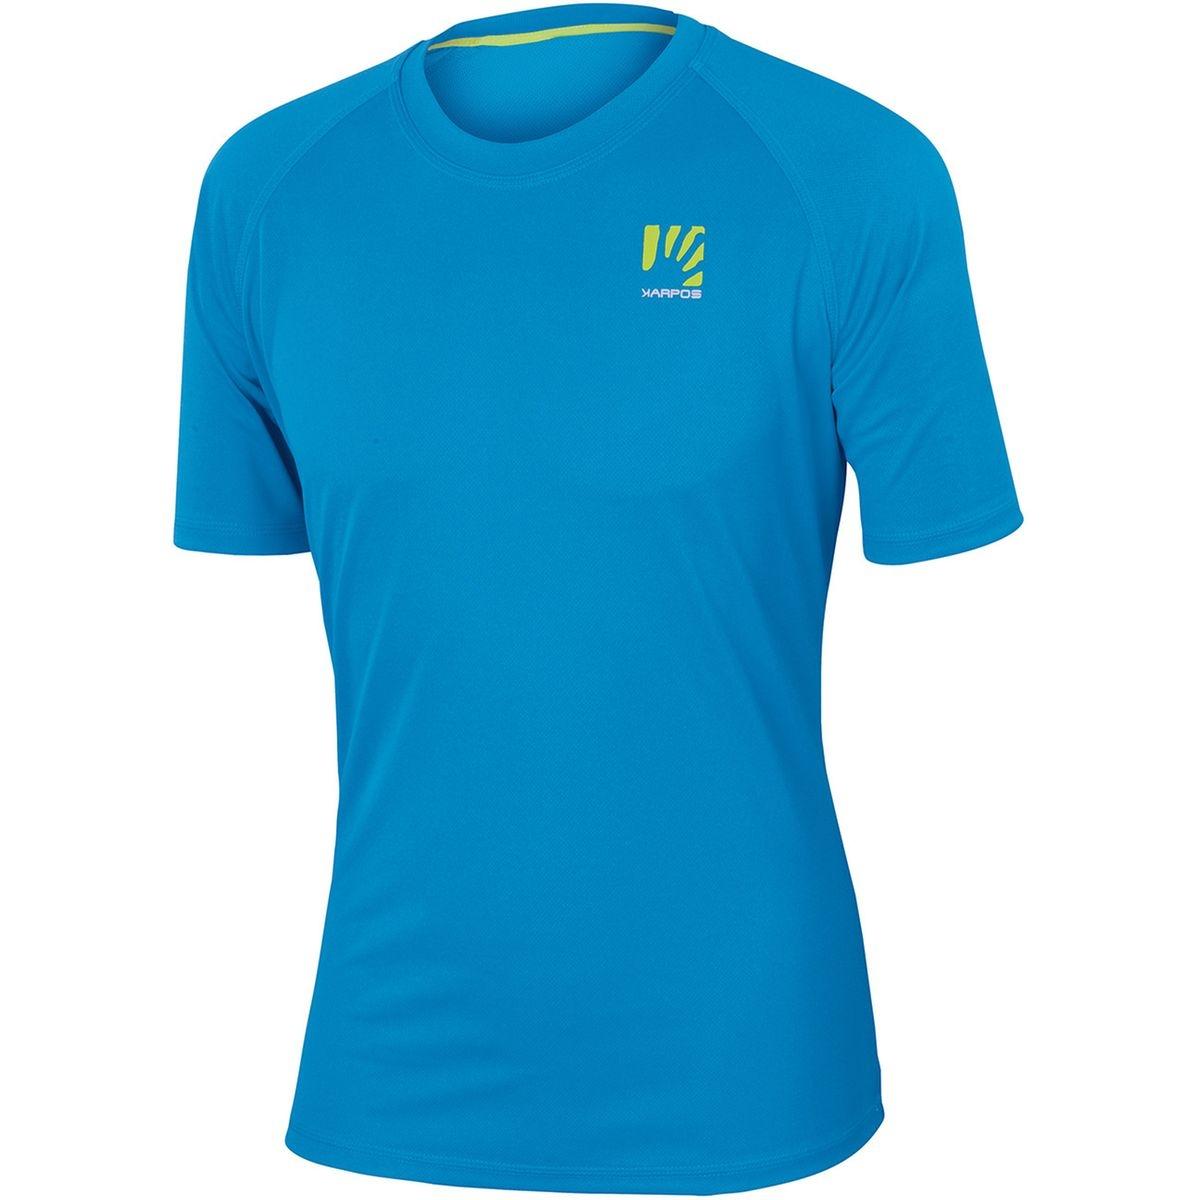 Hill Evo - T-shirt manches courtes Homme - bleu